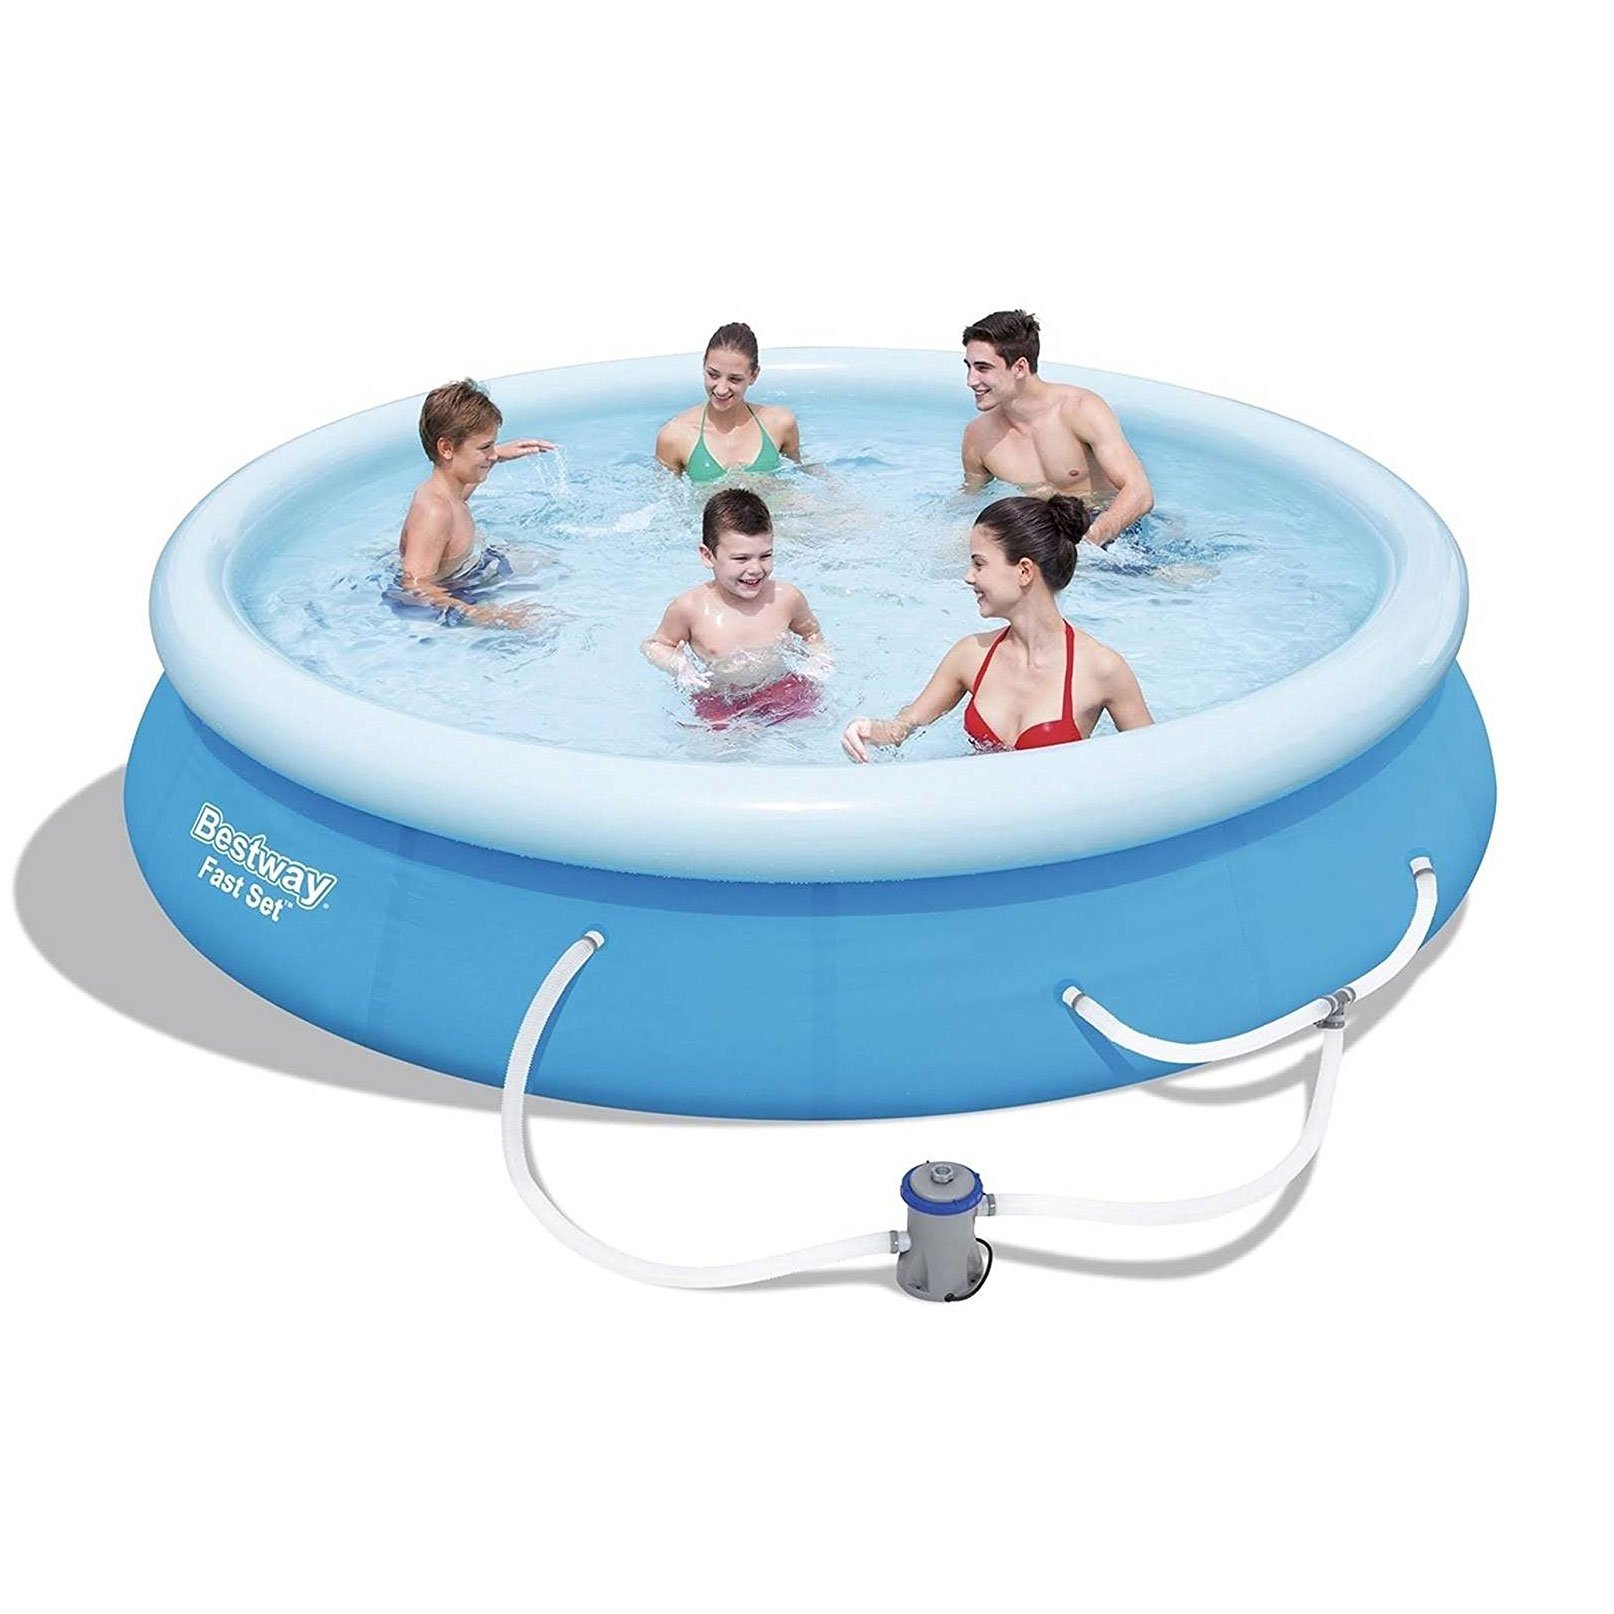 "Bestway 10ft x 30"" Fast Set Swimming Paddling Water Pool Summer Fun Splash Fun"